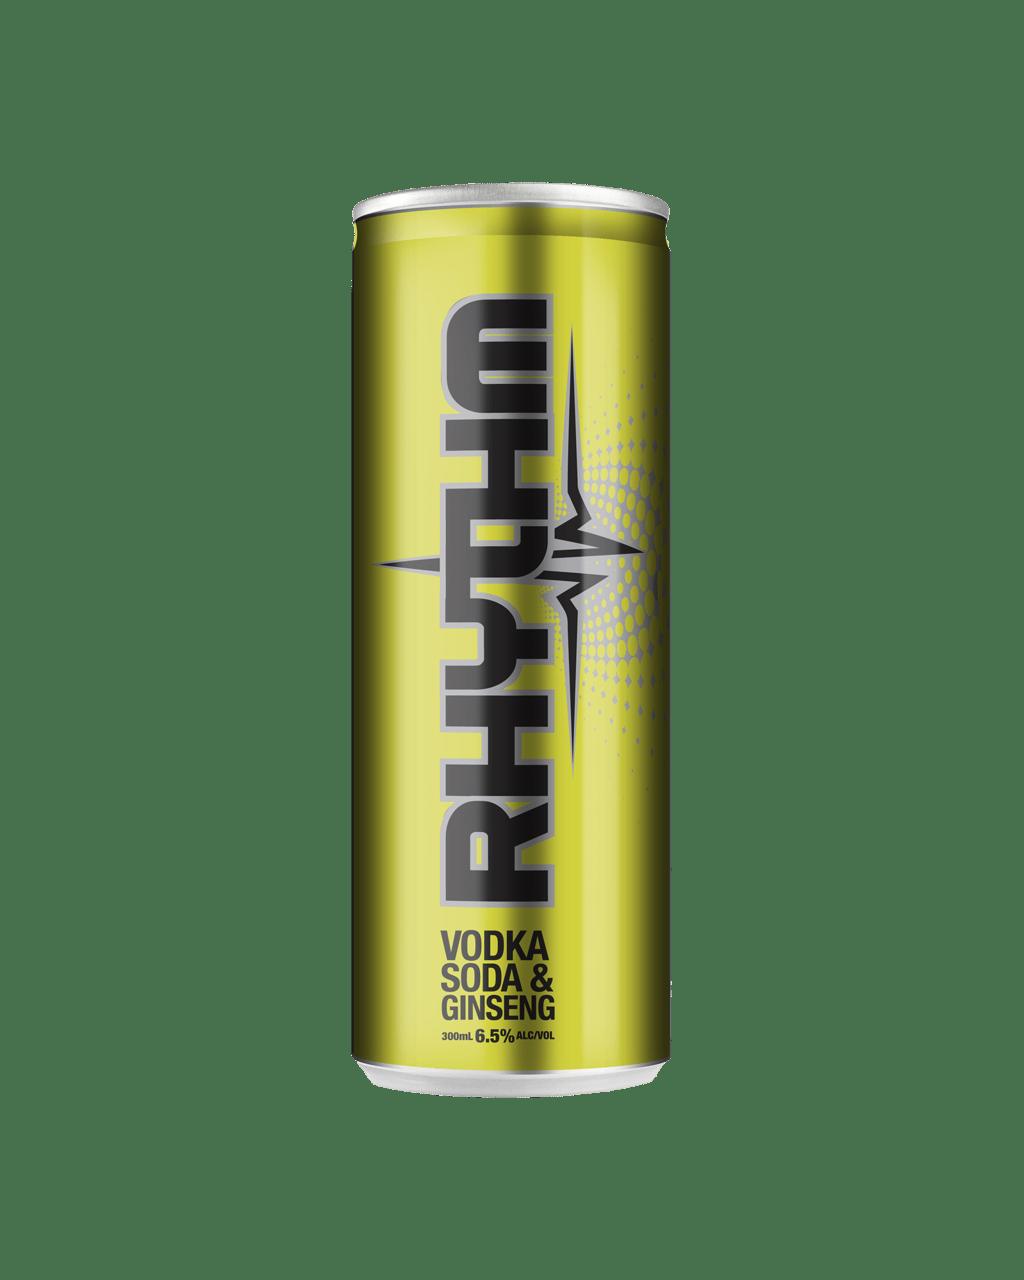 63db968468f8 Rhythm Vodka Soda   Ginseng 300mL